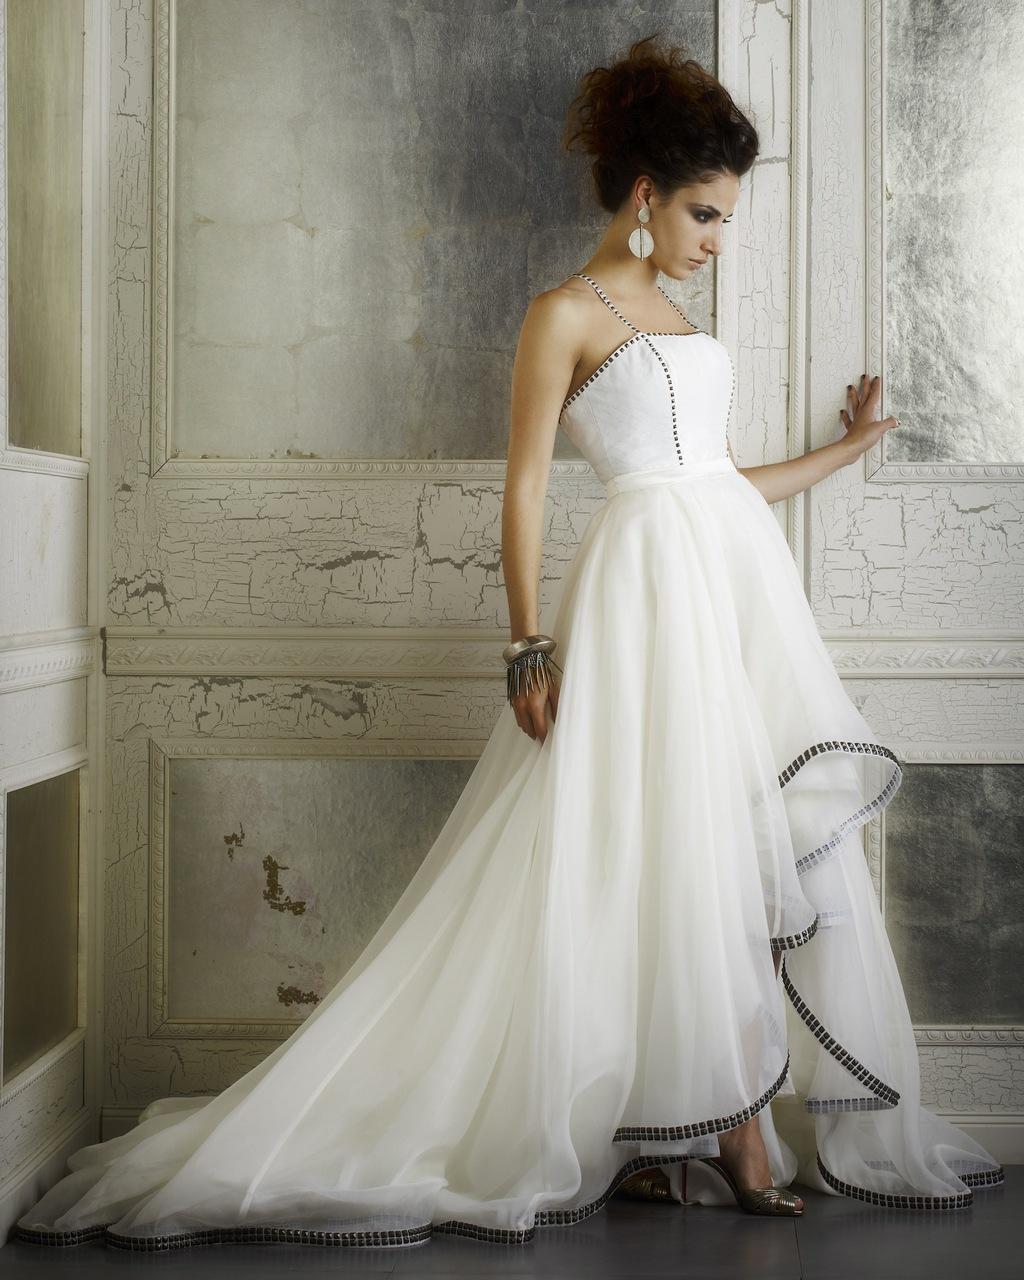 Della_giovanna_tristan_corset_reegan_skirt.full